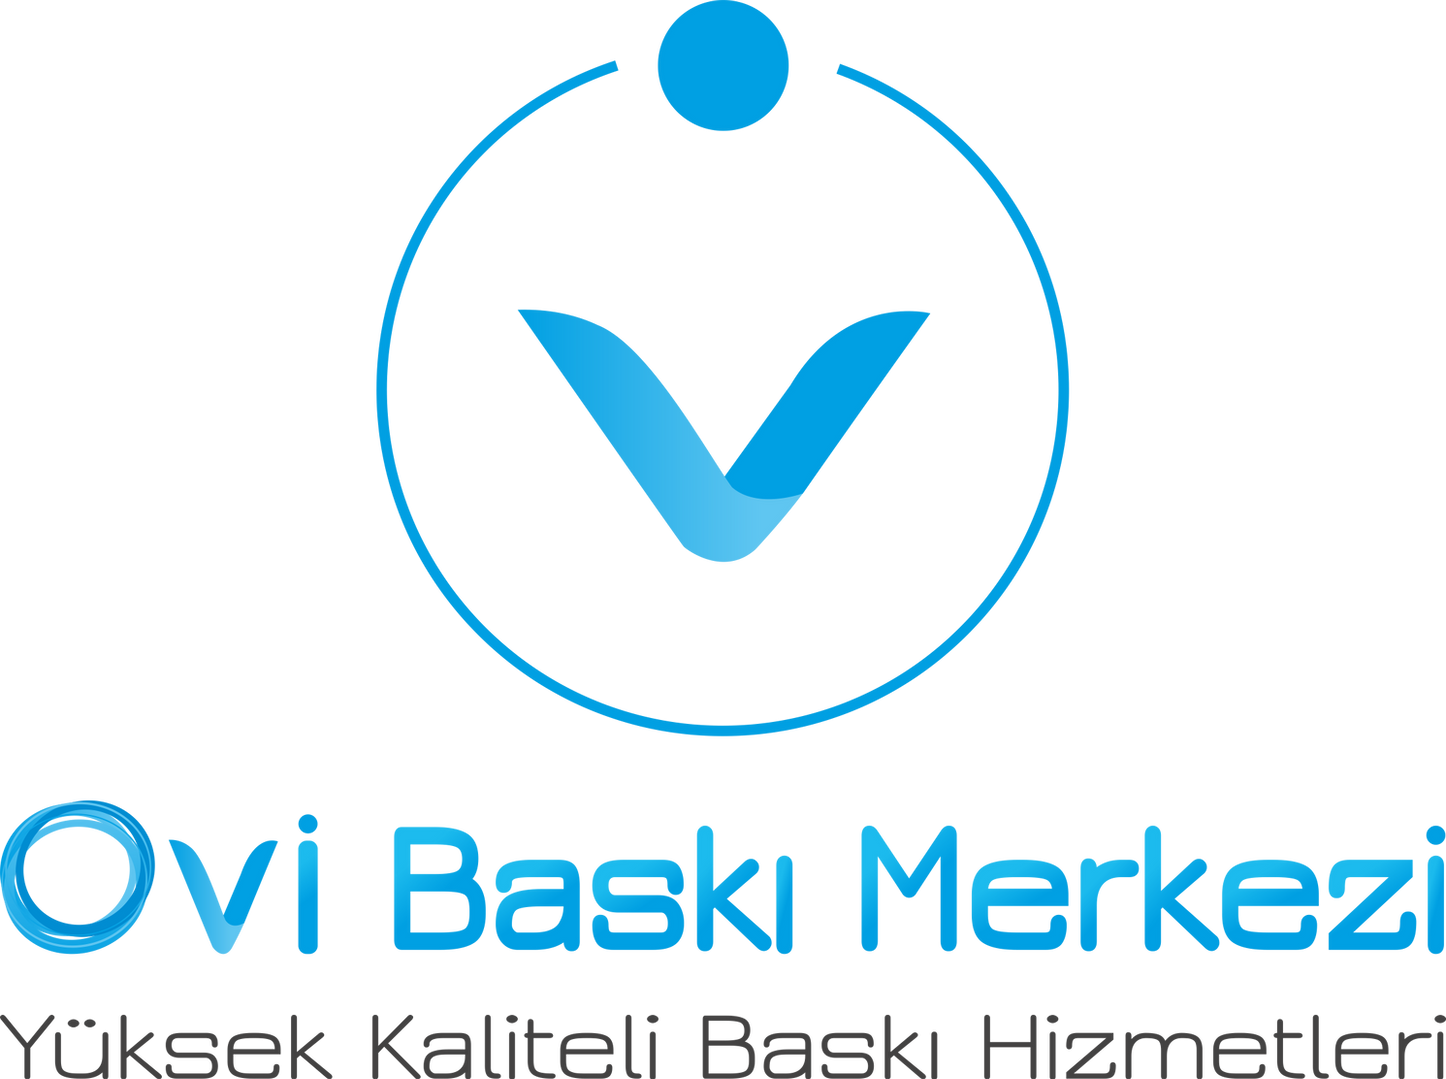 Ovi_Baskı_Merkezi_-_Logo.png